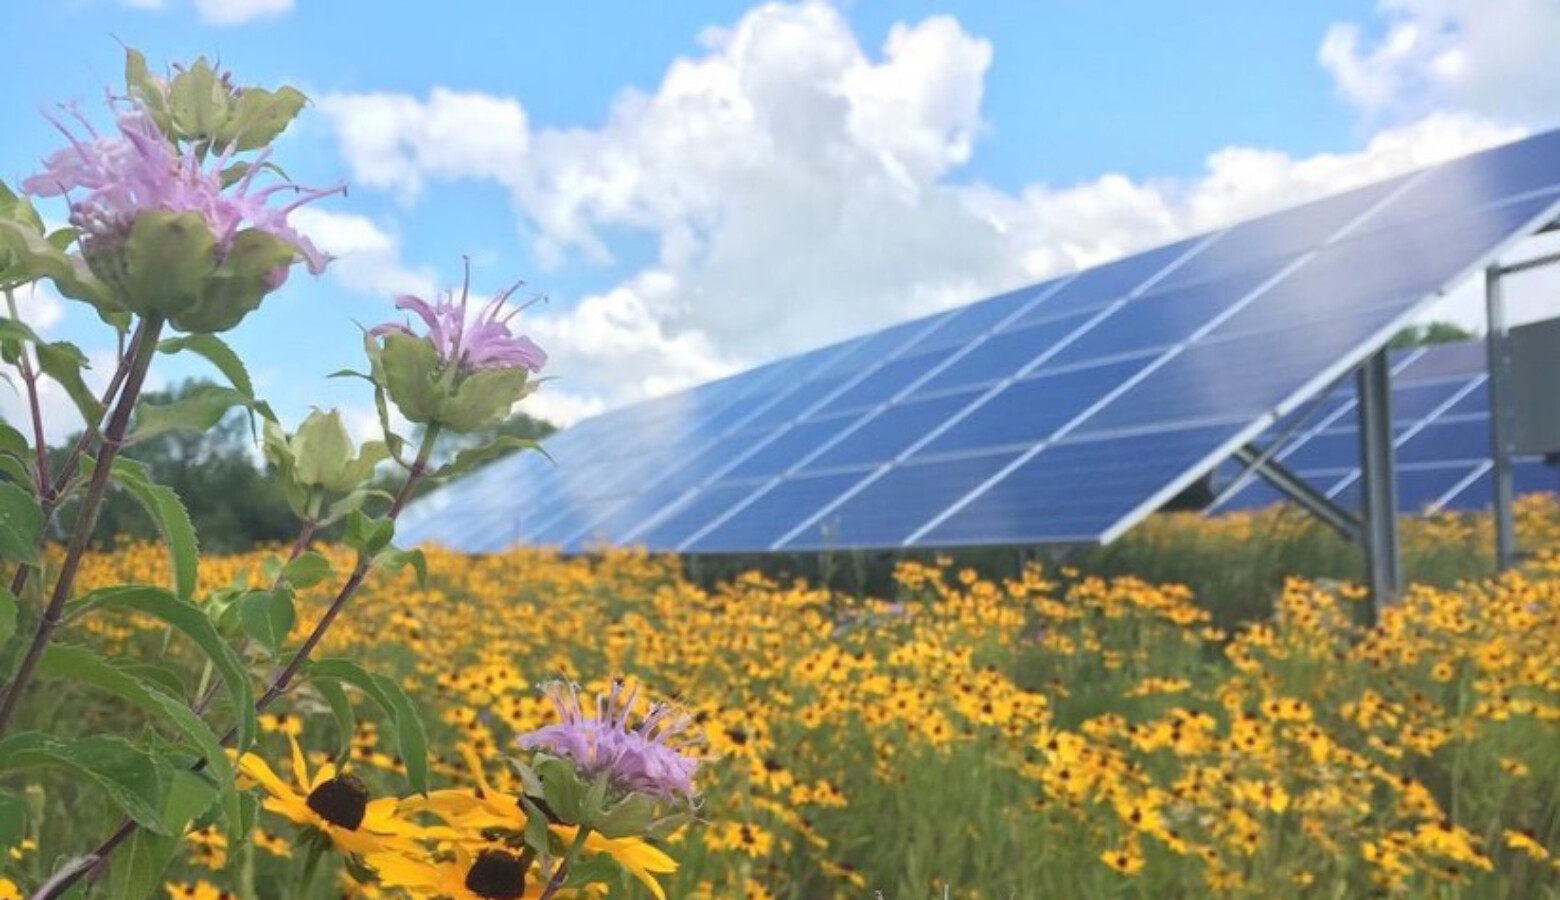 Native plants near a solar panel. (Courtesy of Fresh Energy)